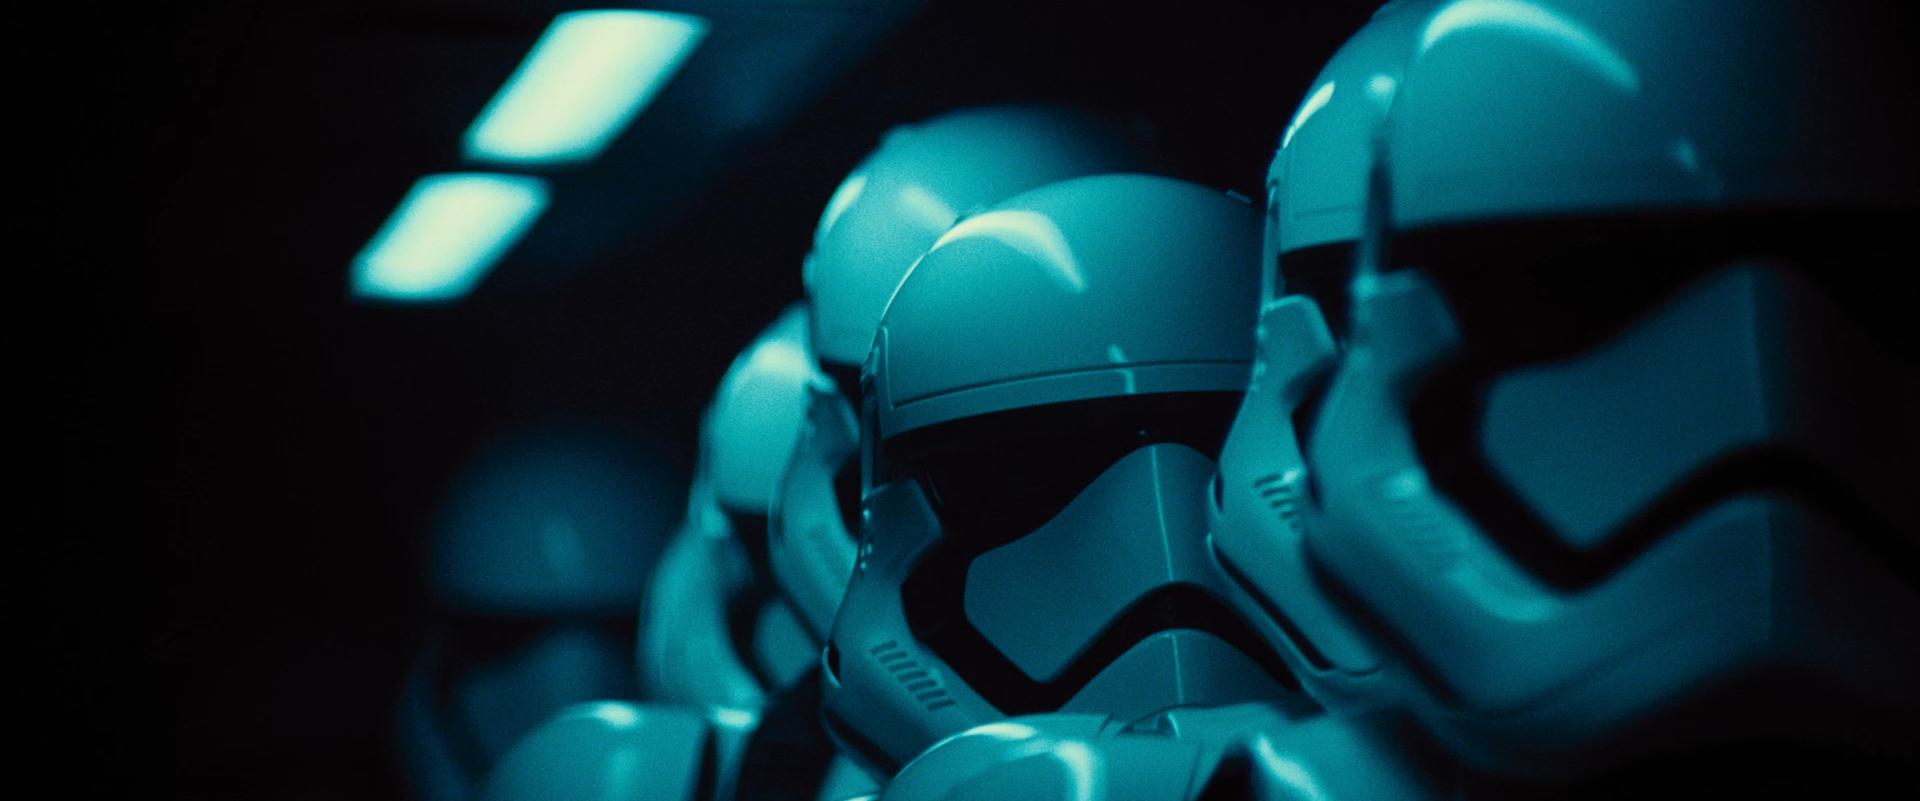 stormtrooper wallpaper hd ipad